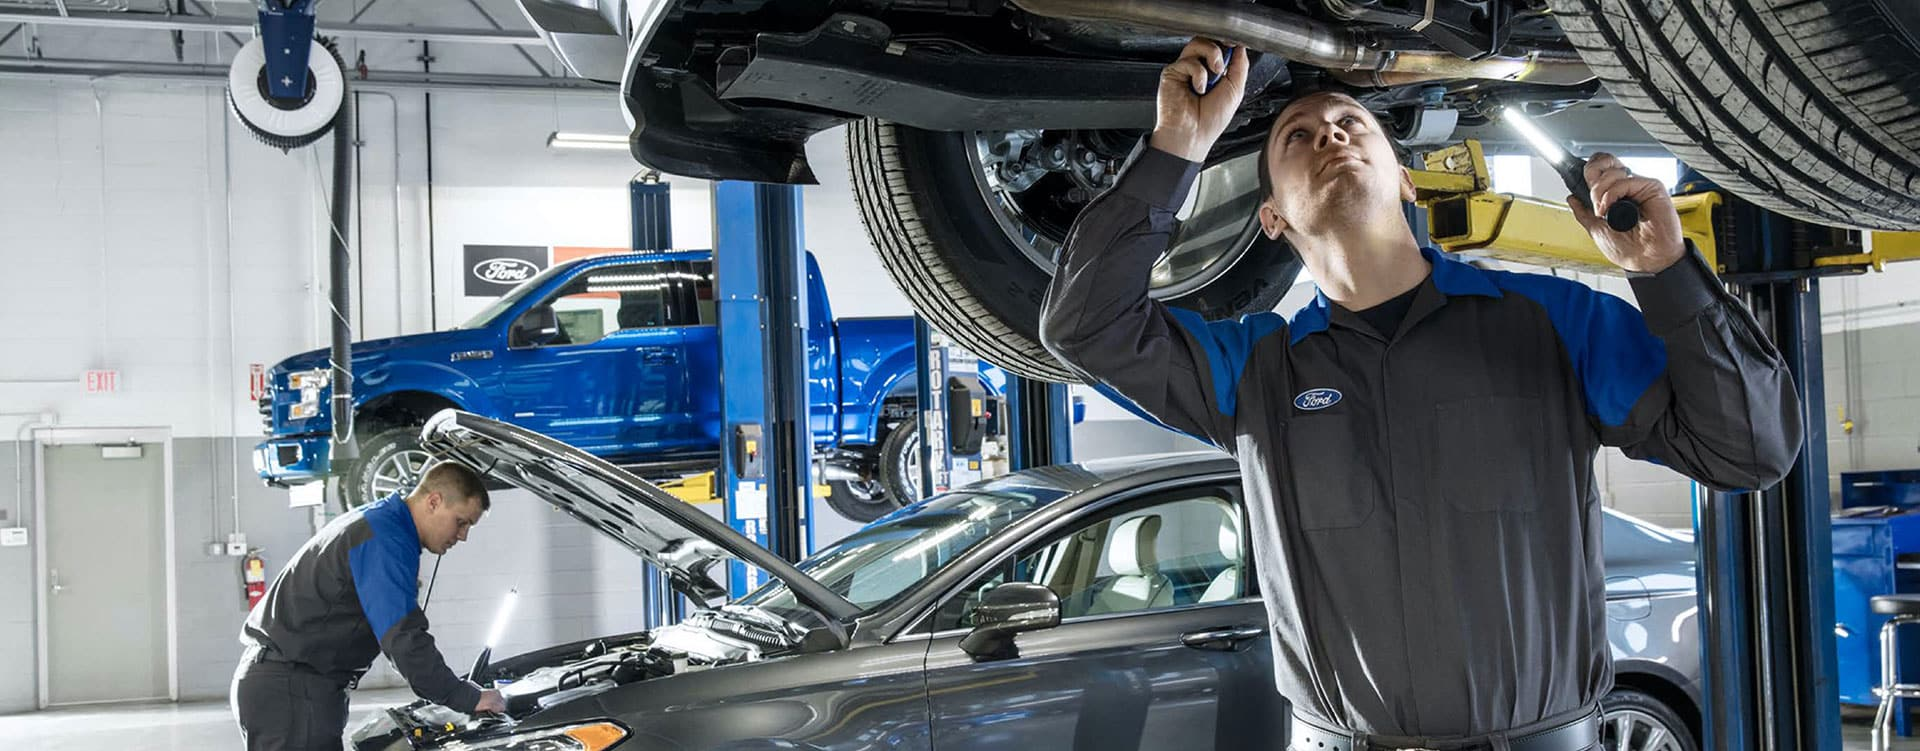 Mechanics working on Ford vehicles